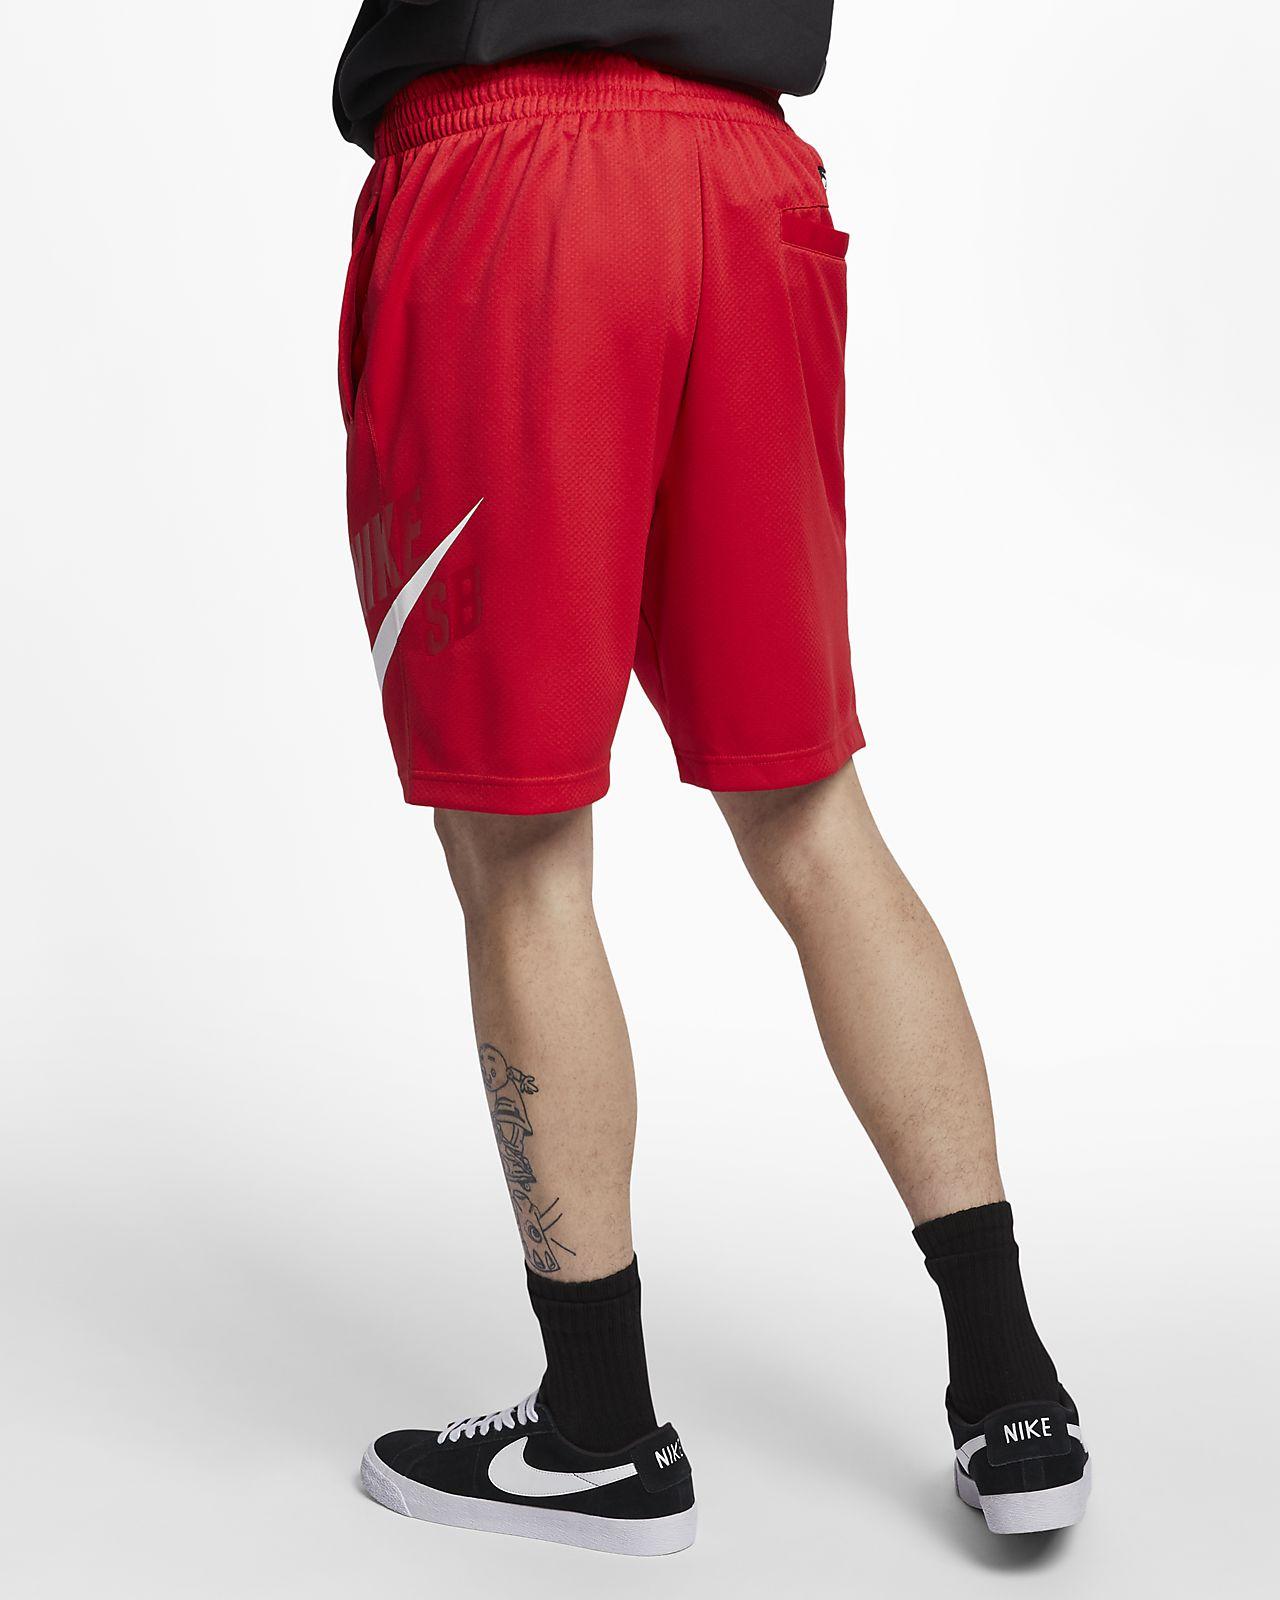 4c11dd7149d3 Nike SB Dri-FIT Sunday Men s Skate Shorts. Nike.com DK